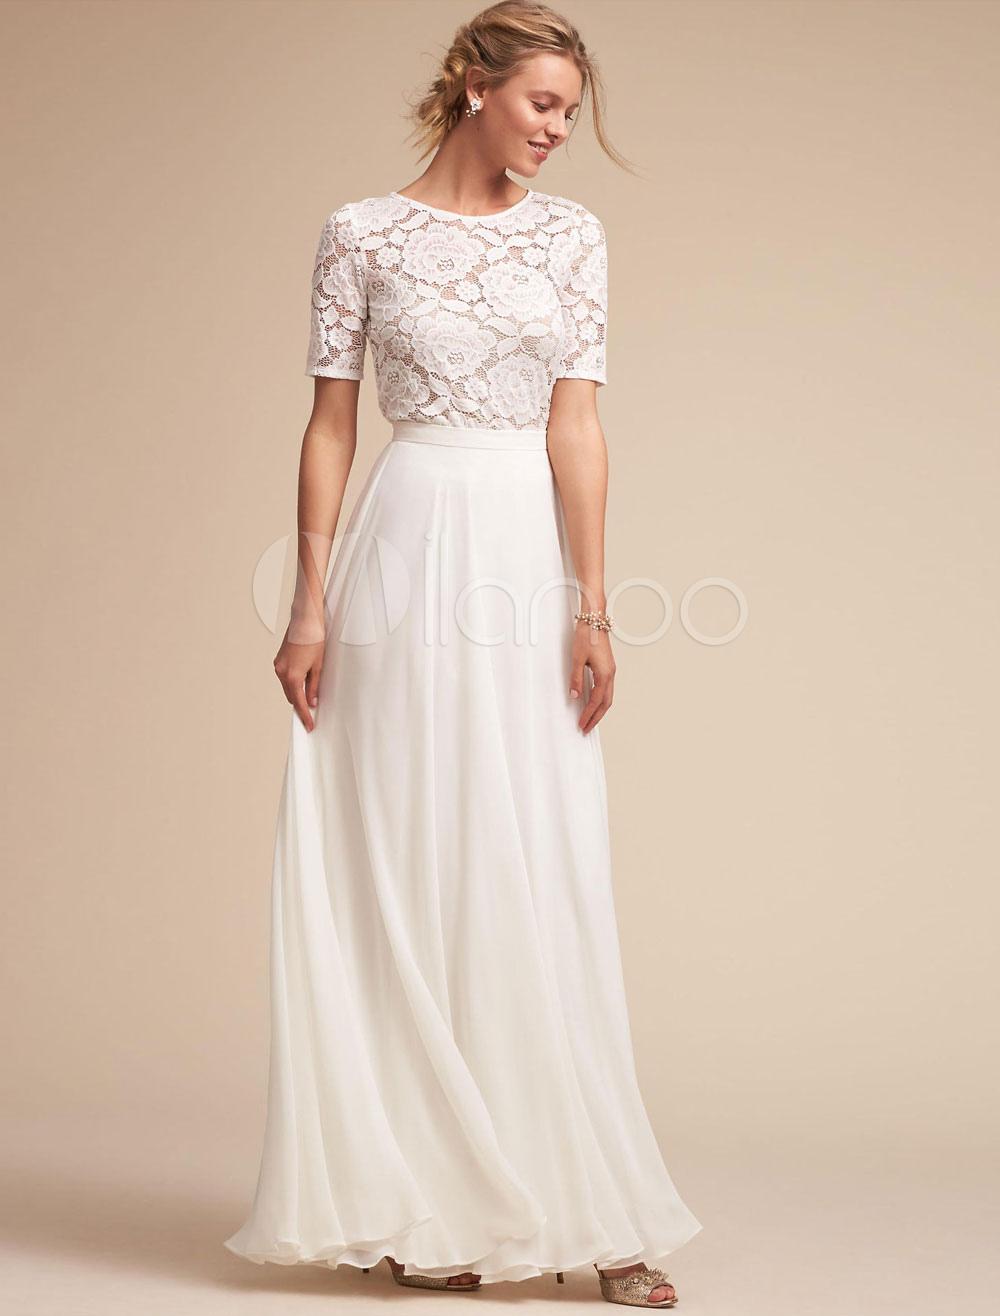 White Long Dress Lace Prom Dress Women Chiffon Short Sleeve Maxi Party Dress